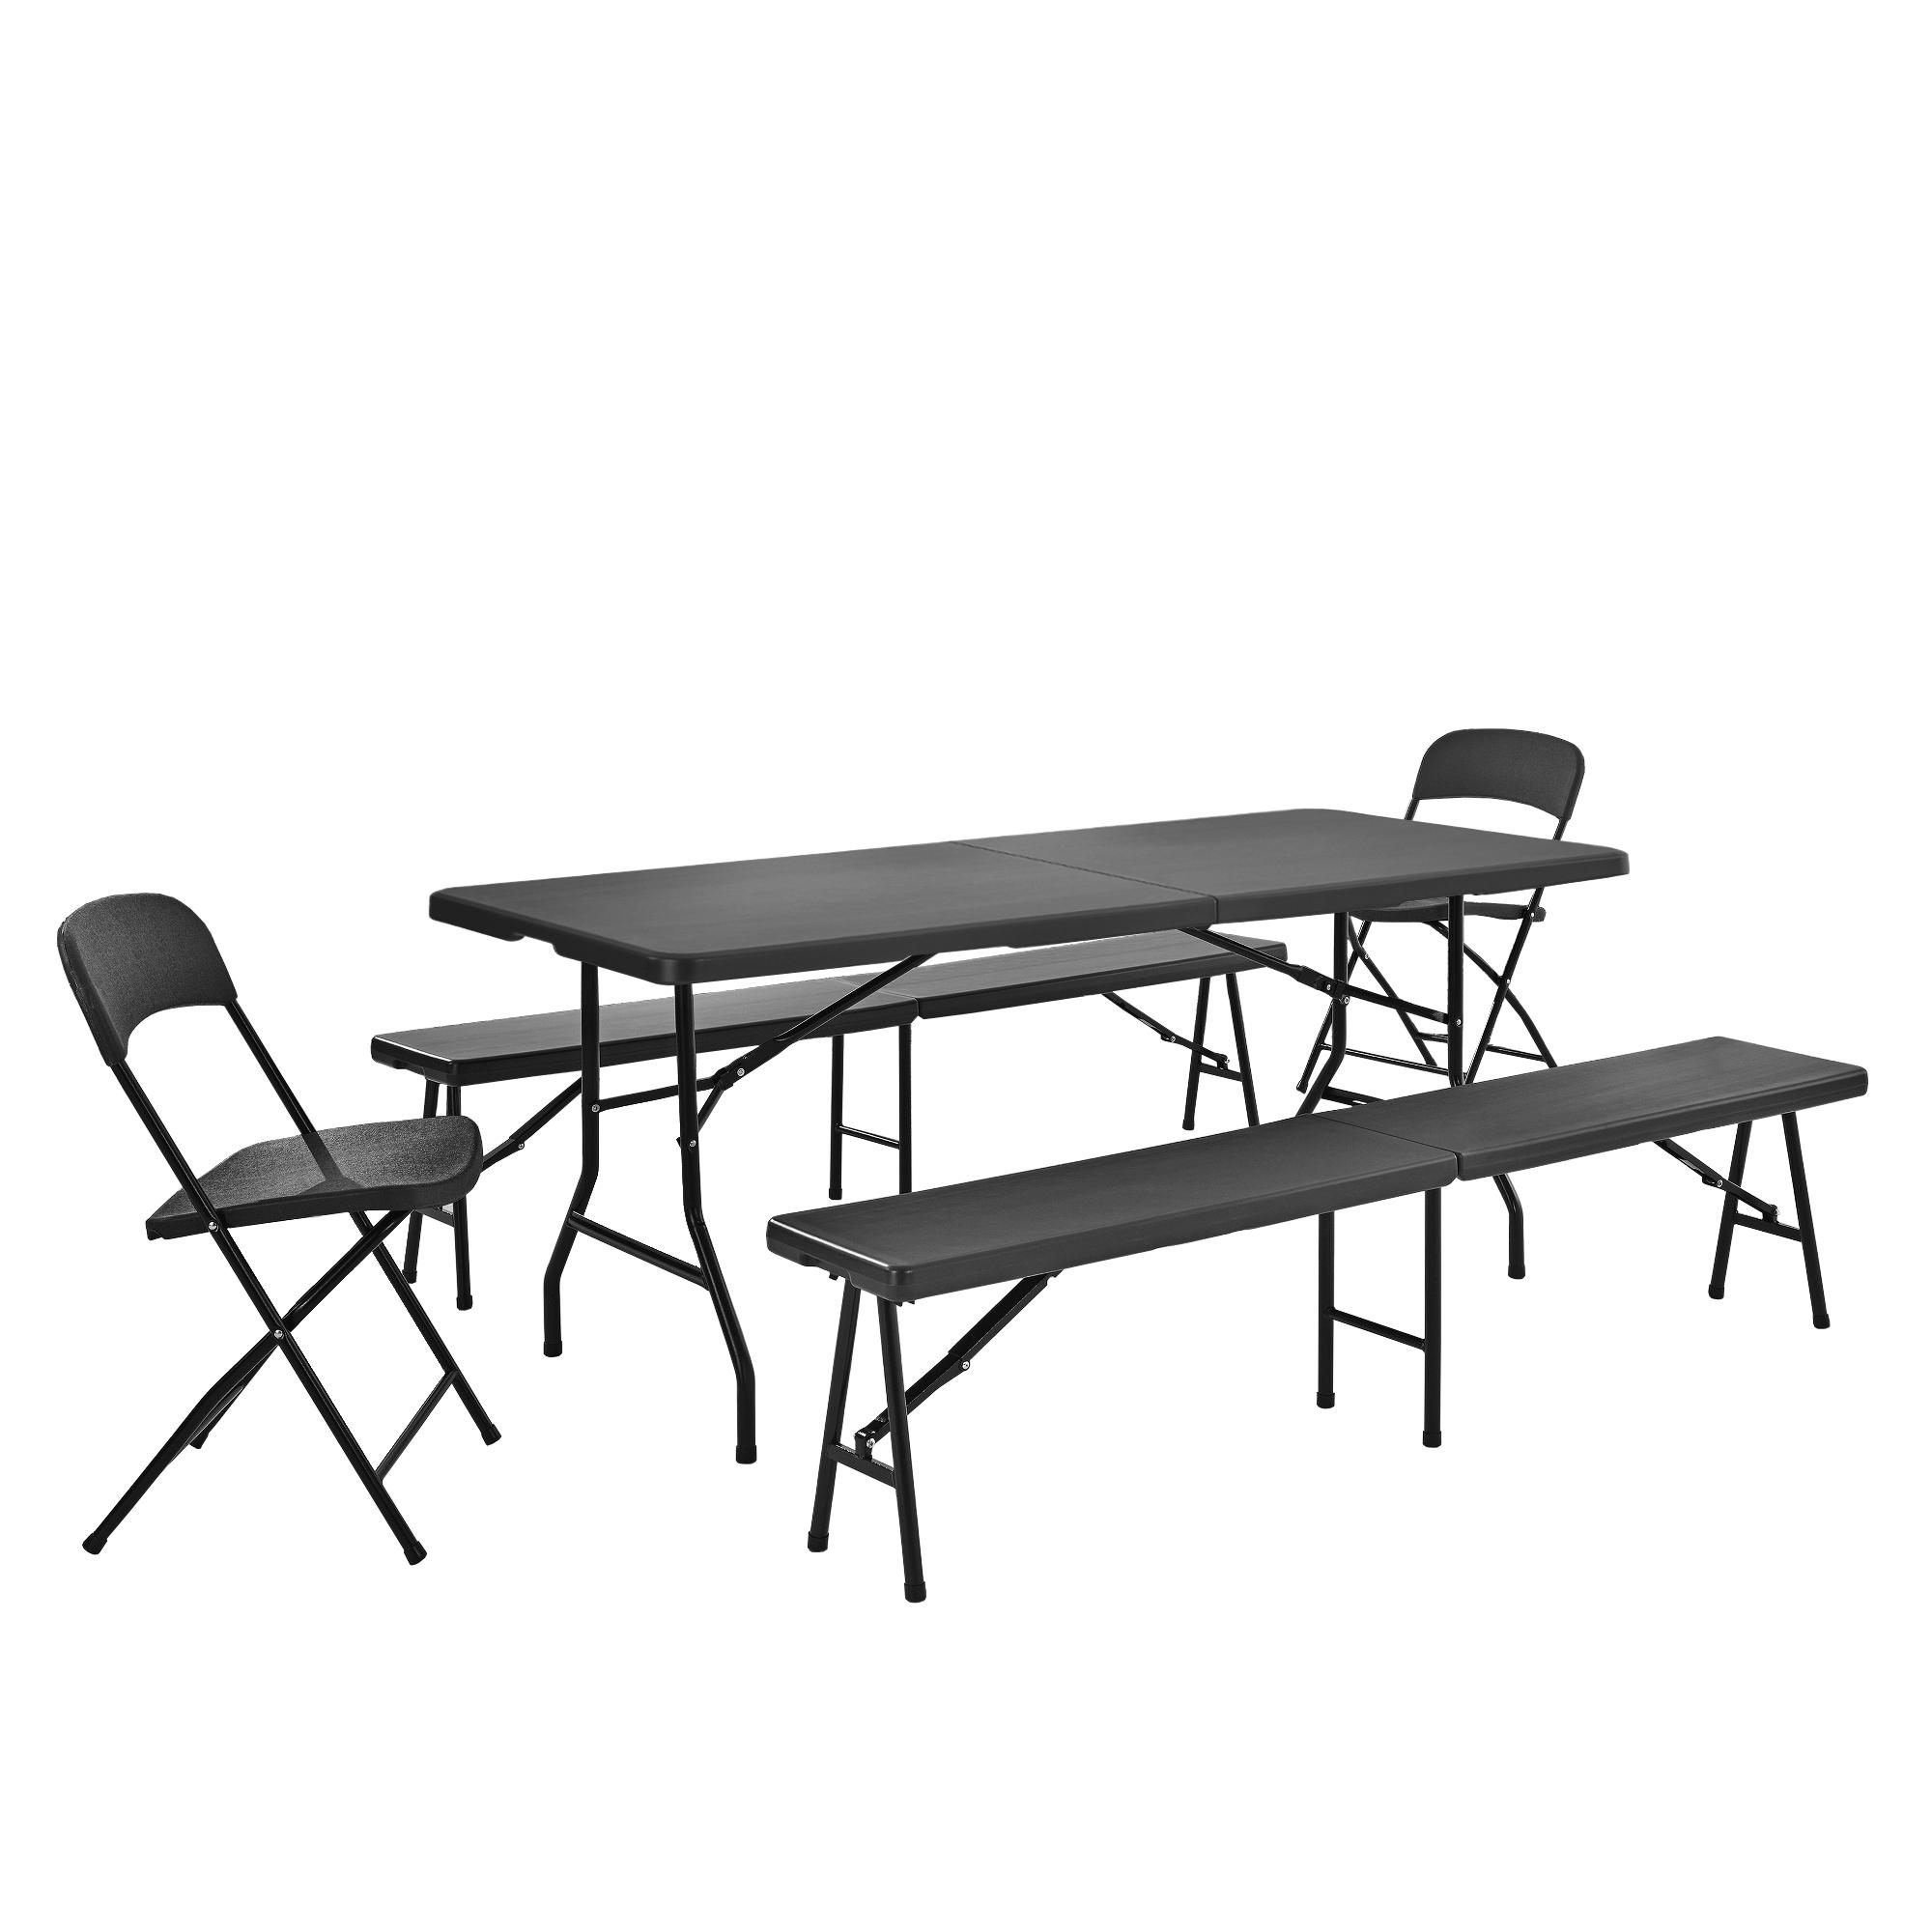 tisch 2 st hle b nke grau tischgruppe camping bier garten gruppe ebay. Black Bedroom Furniture Sets. Home Design Ideas